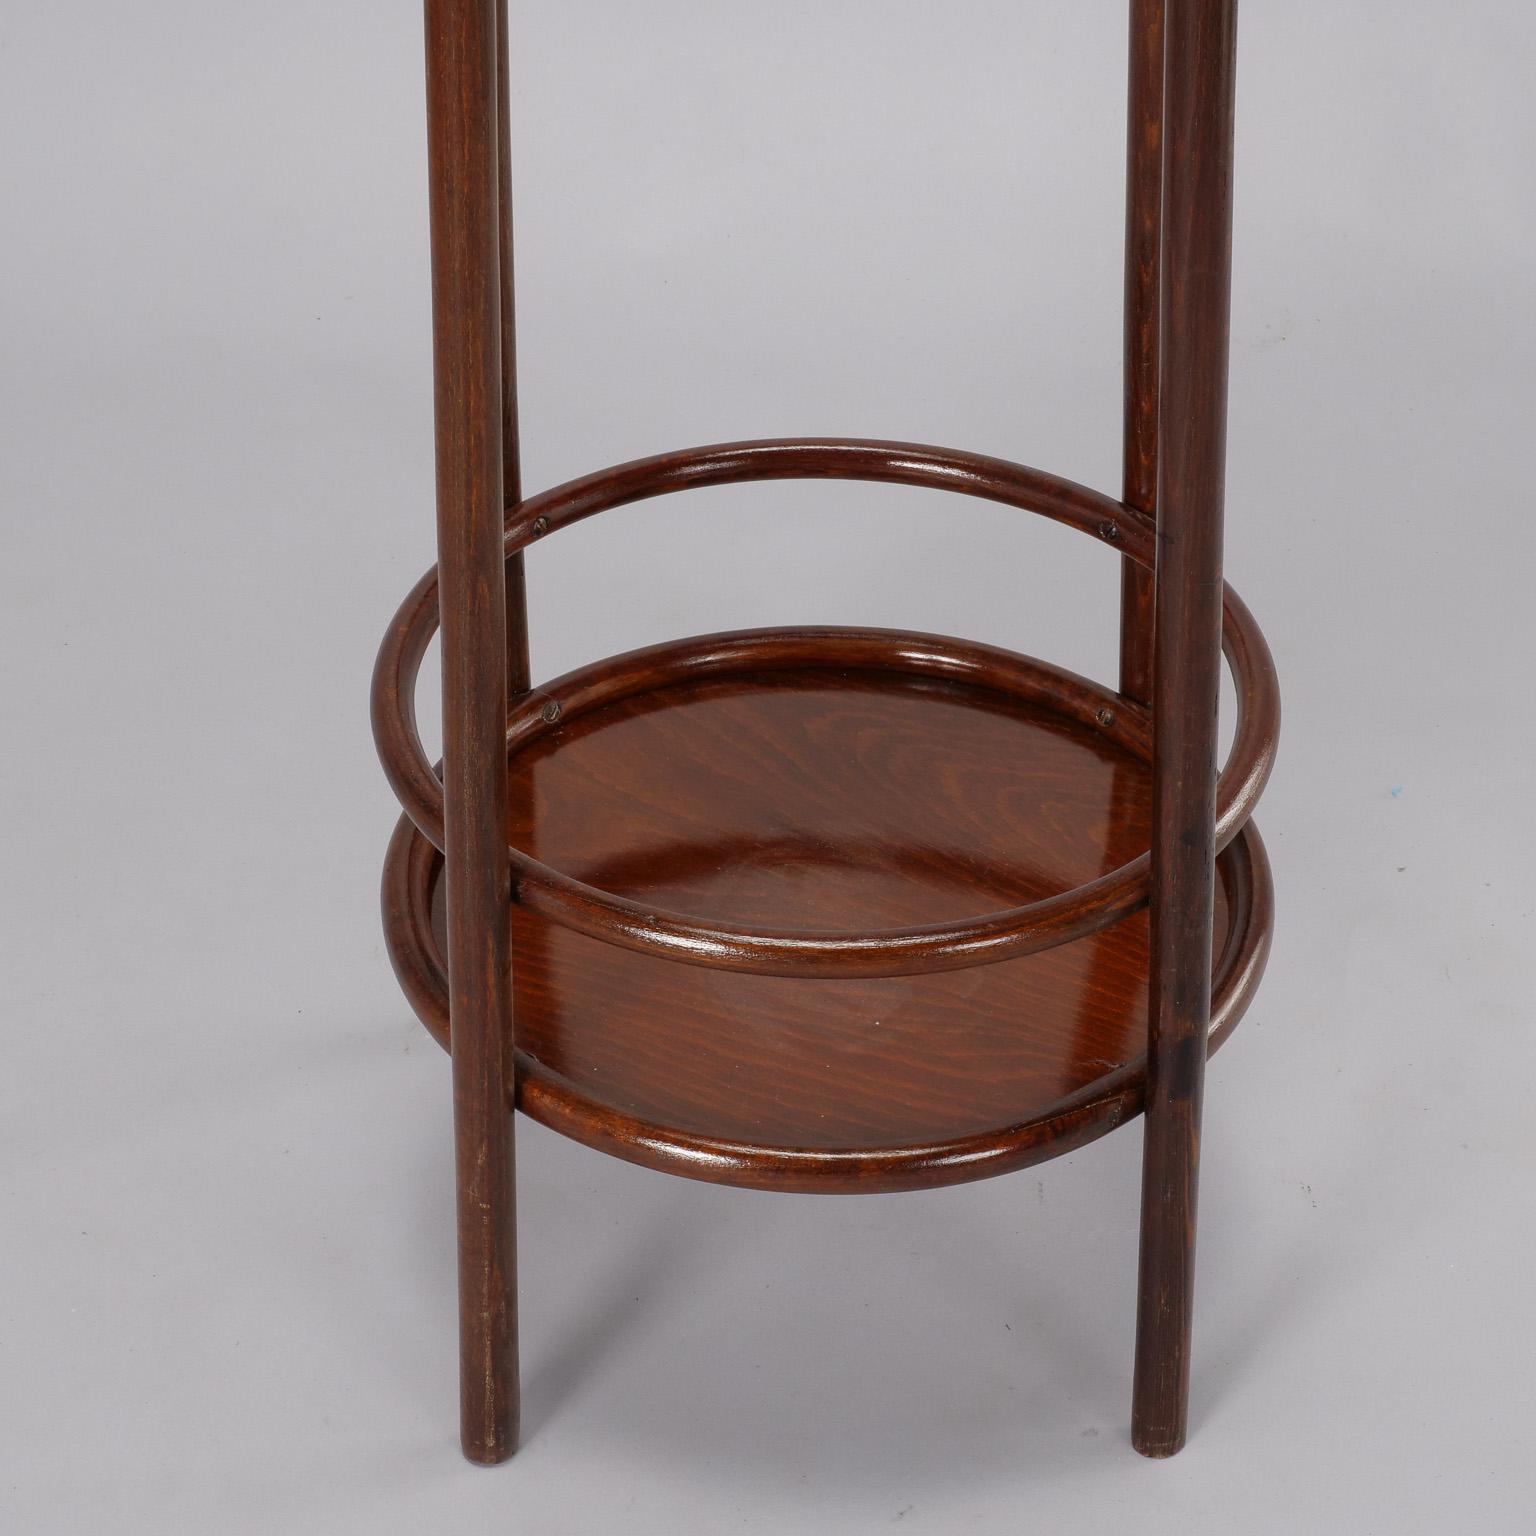 Sophisticated Thonet Art Nouveau Bent Wood Plant Stand Decaso